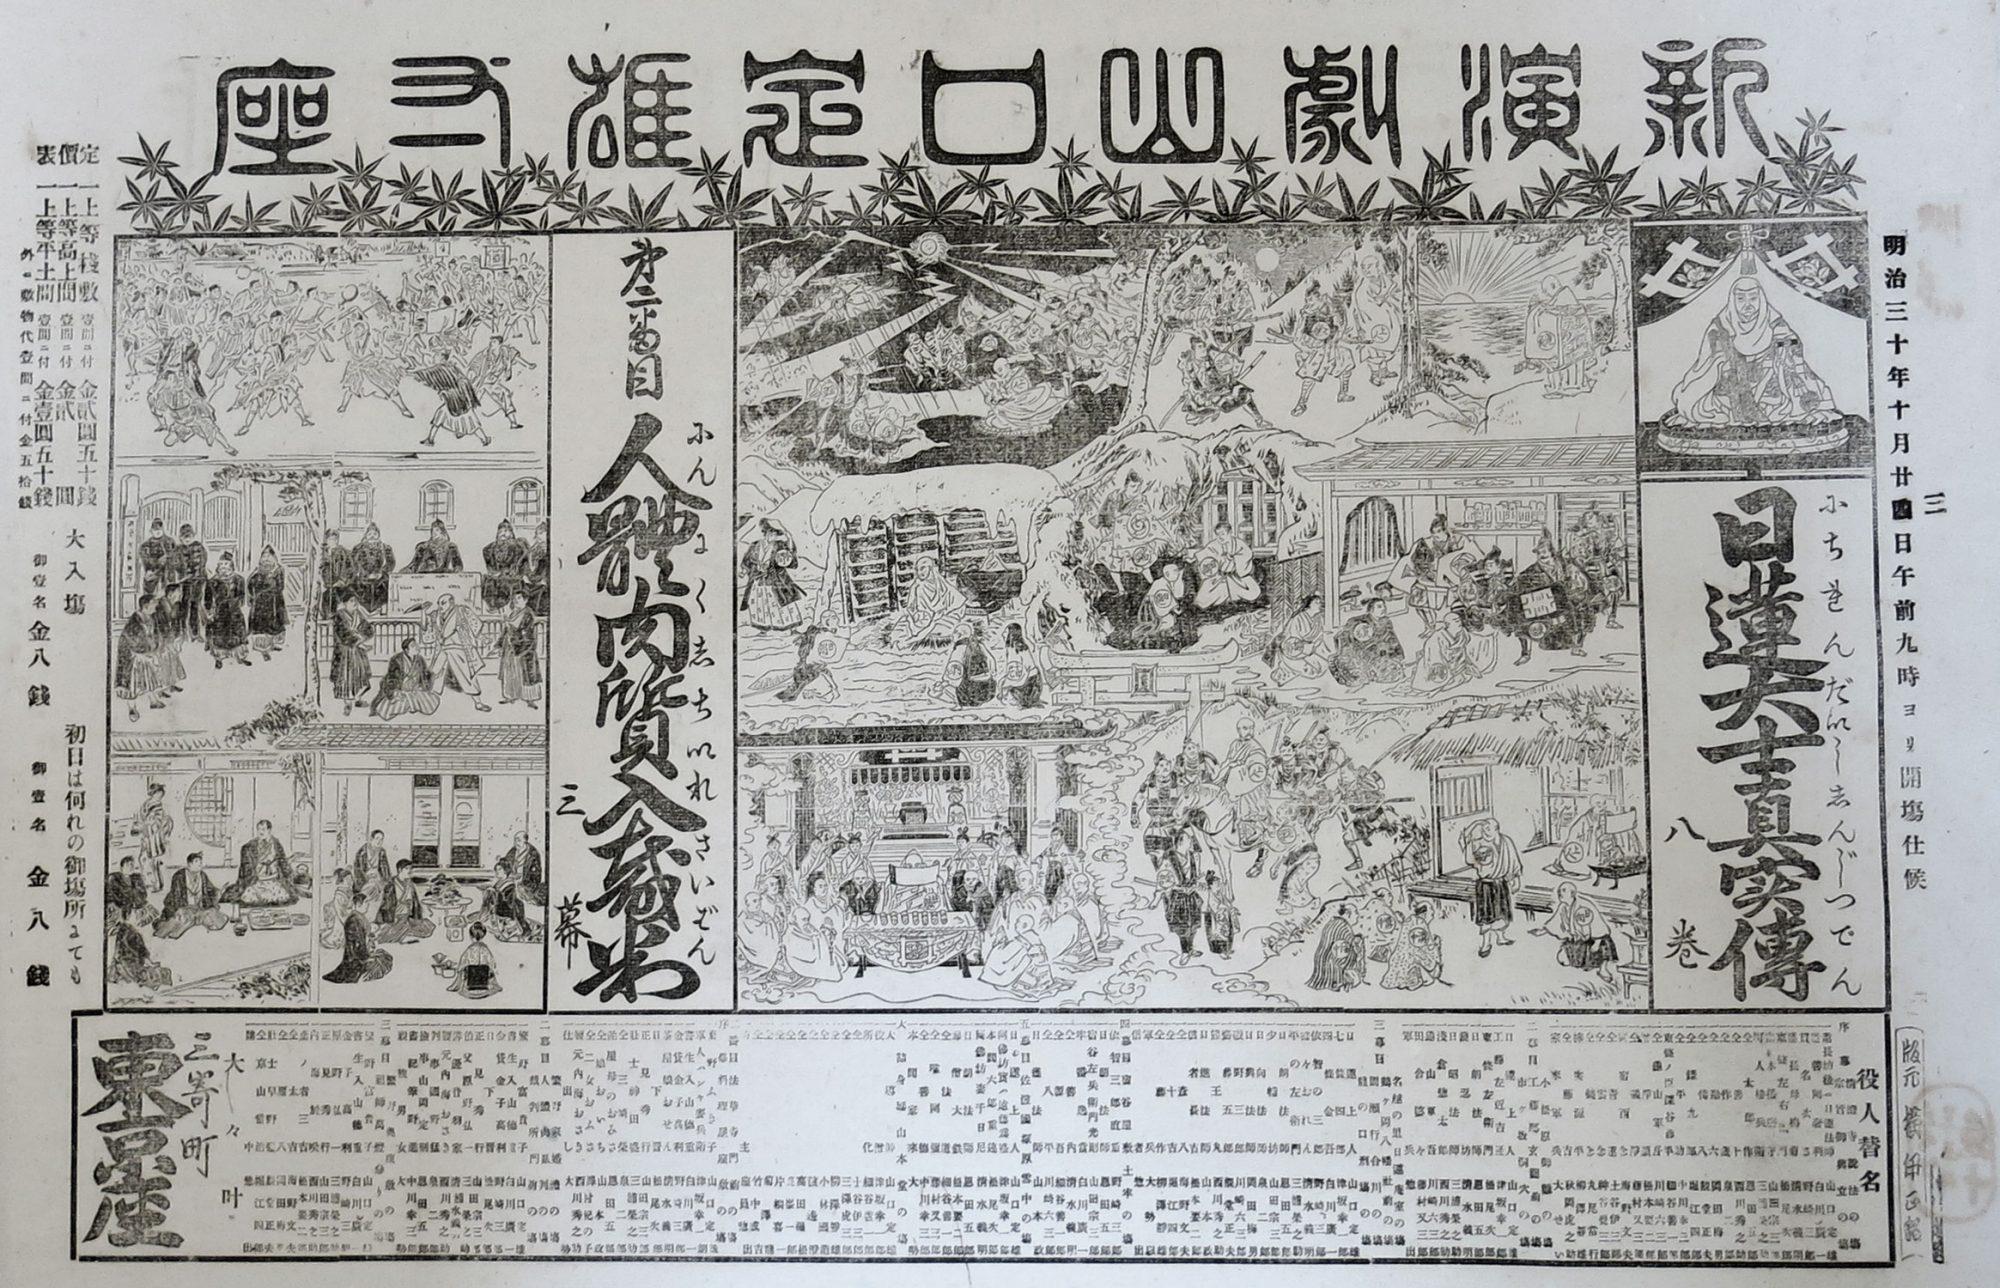 Japanese Representation Program Shin engeki.  新演劇山口定雄一座Shin engeki Yamaguchi Sadao ichiza [Troupe de nouveau théâtre (dirigé par) Yamaguchi Sadao]